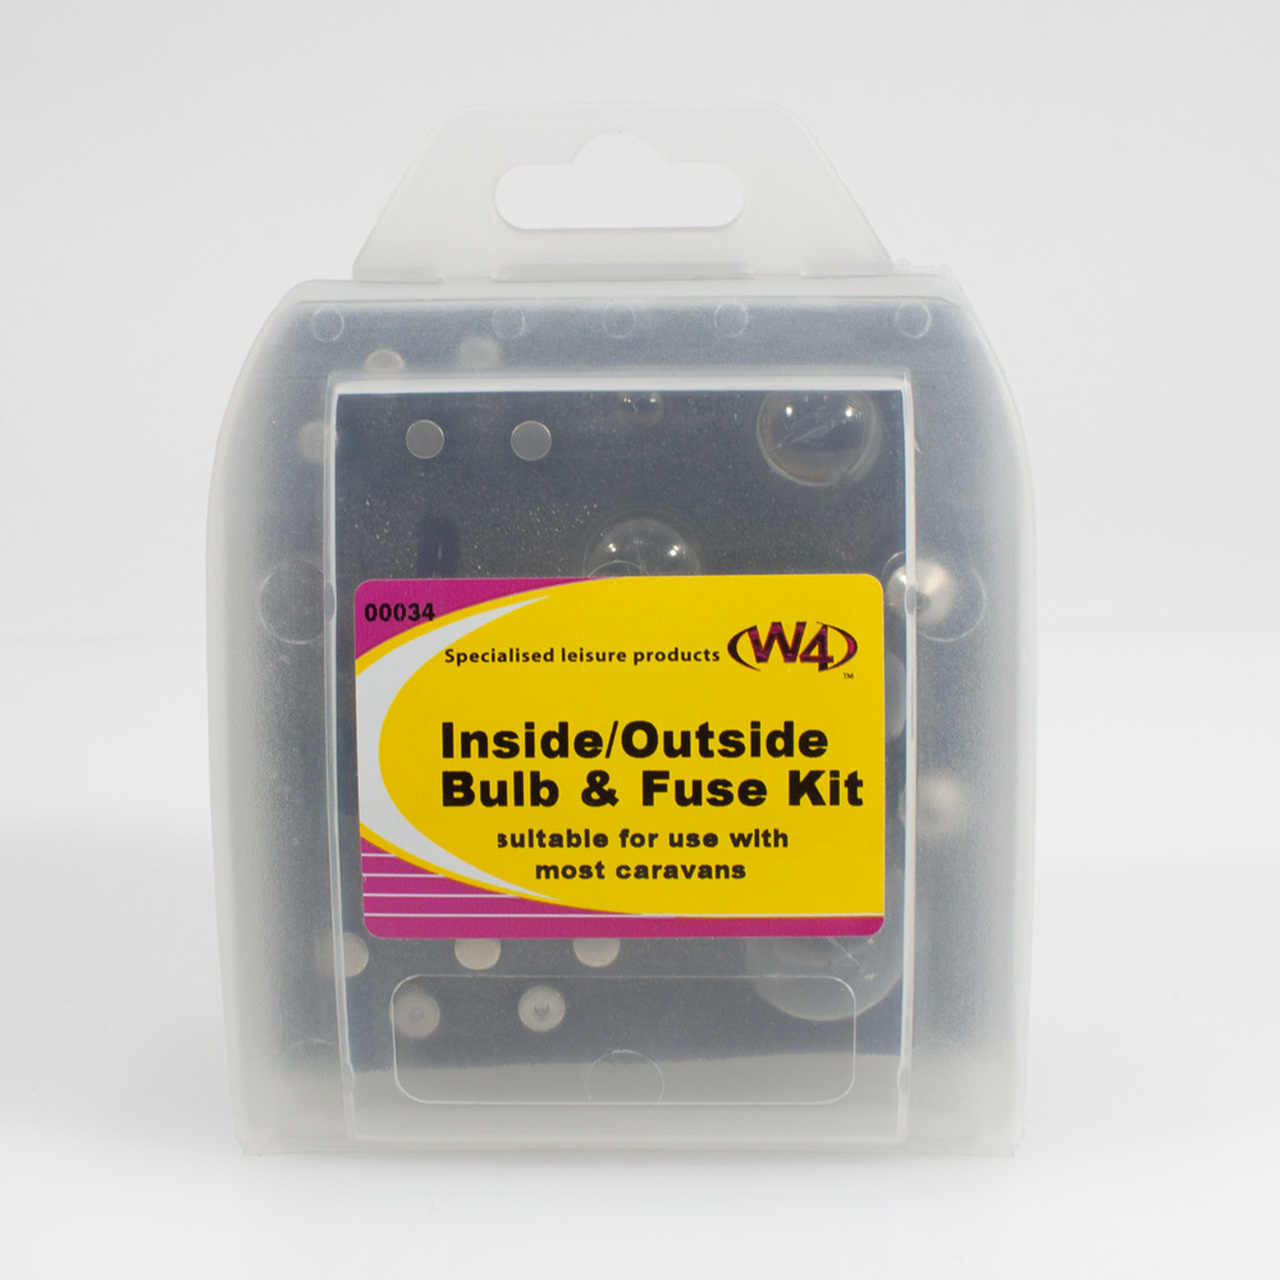 Caravan Bulb & Fuse Kits